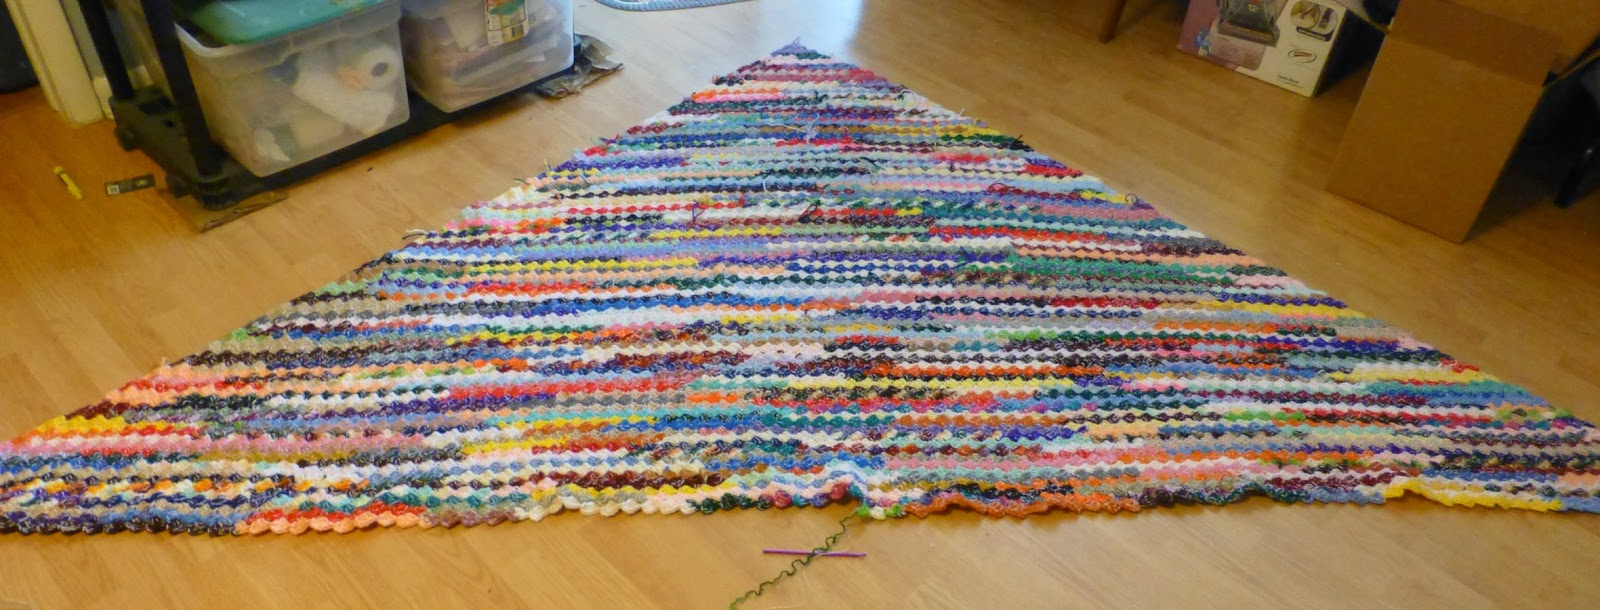 Crochet Pattern For C2c Afghan : Debs Crochet: My Crochet Today C2C Afghan